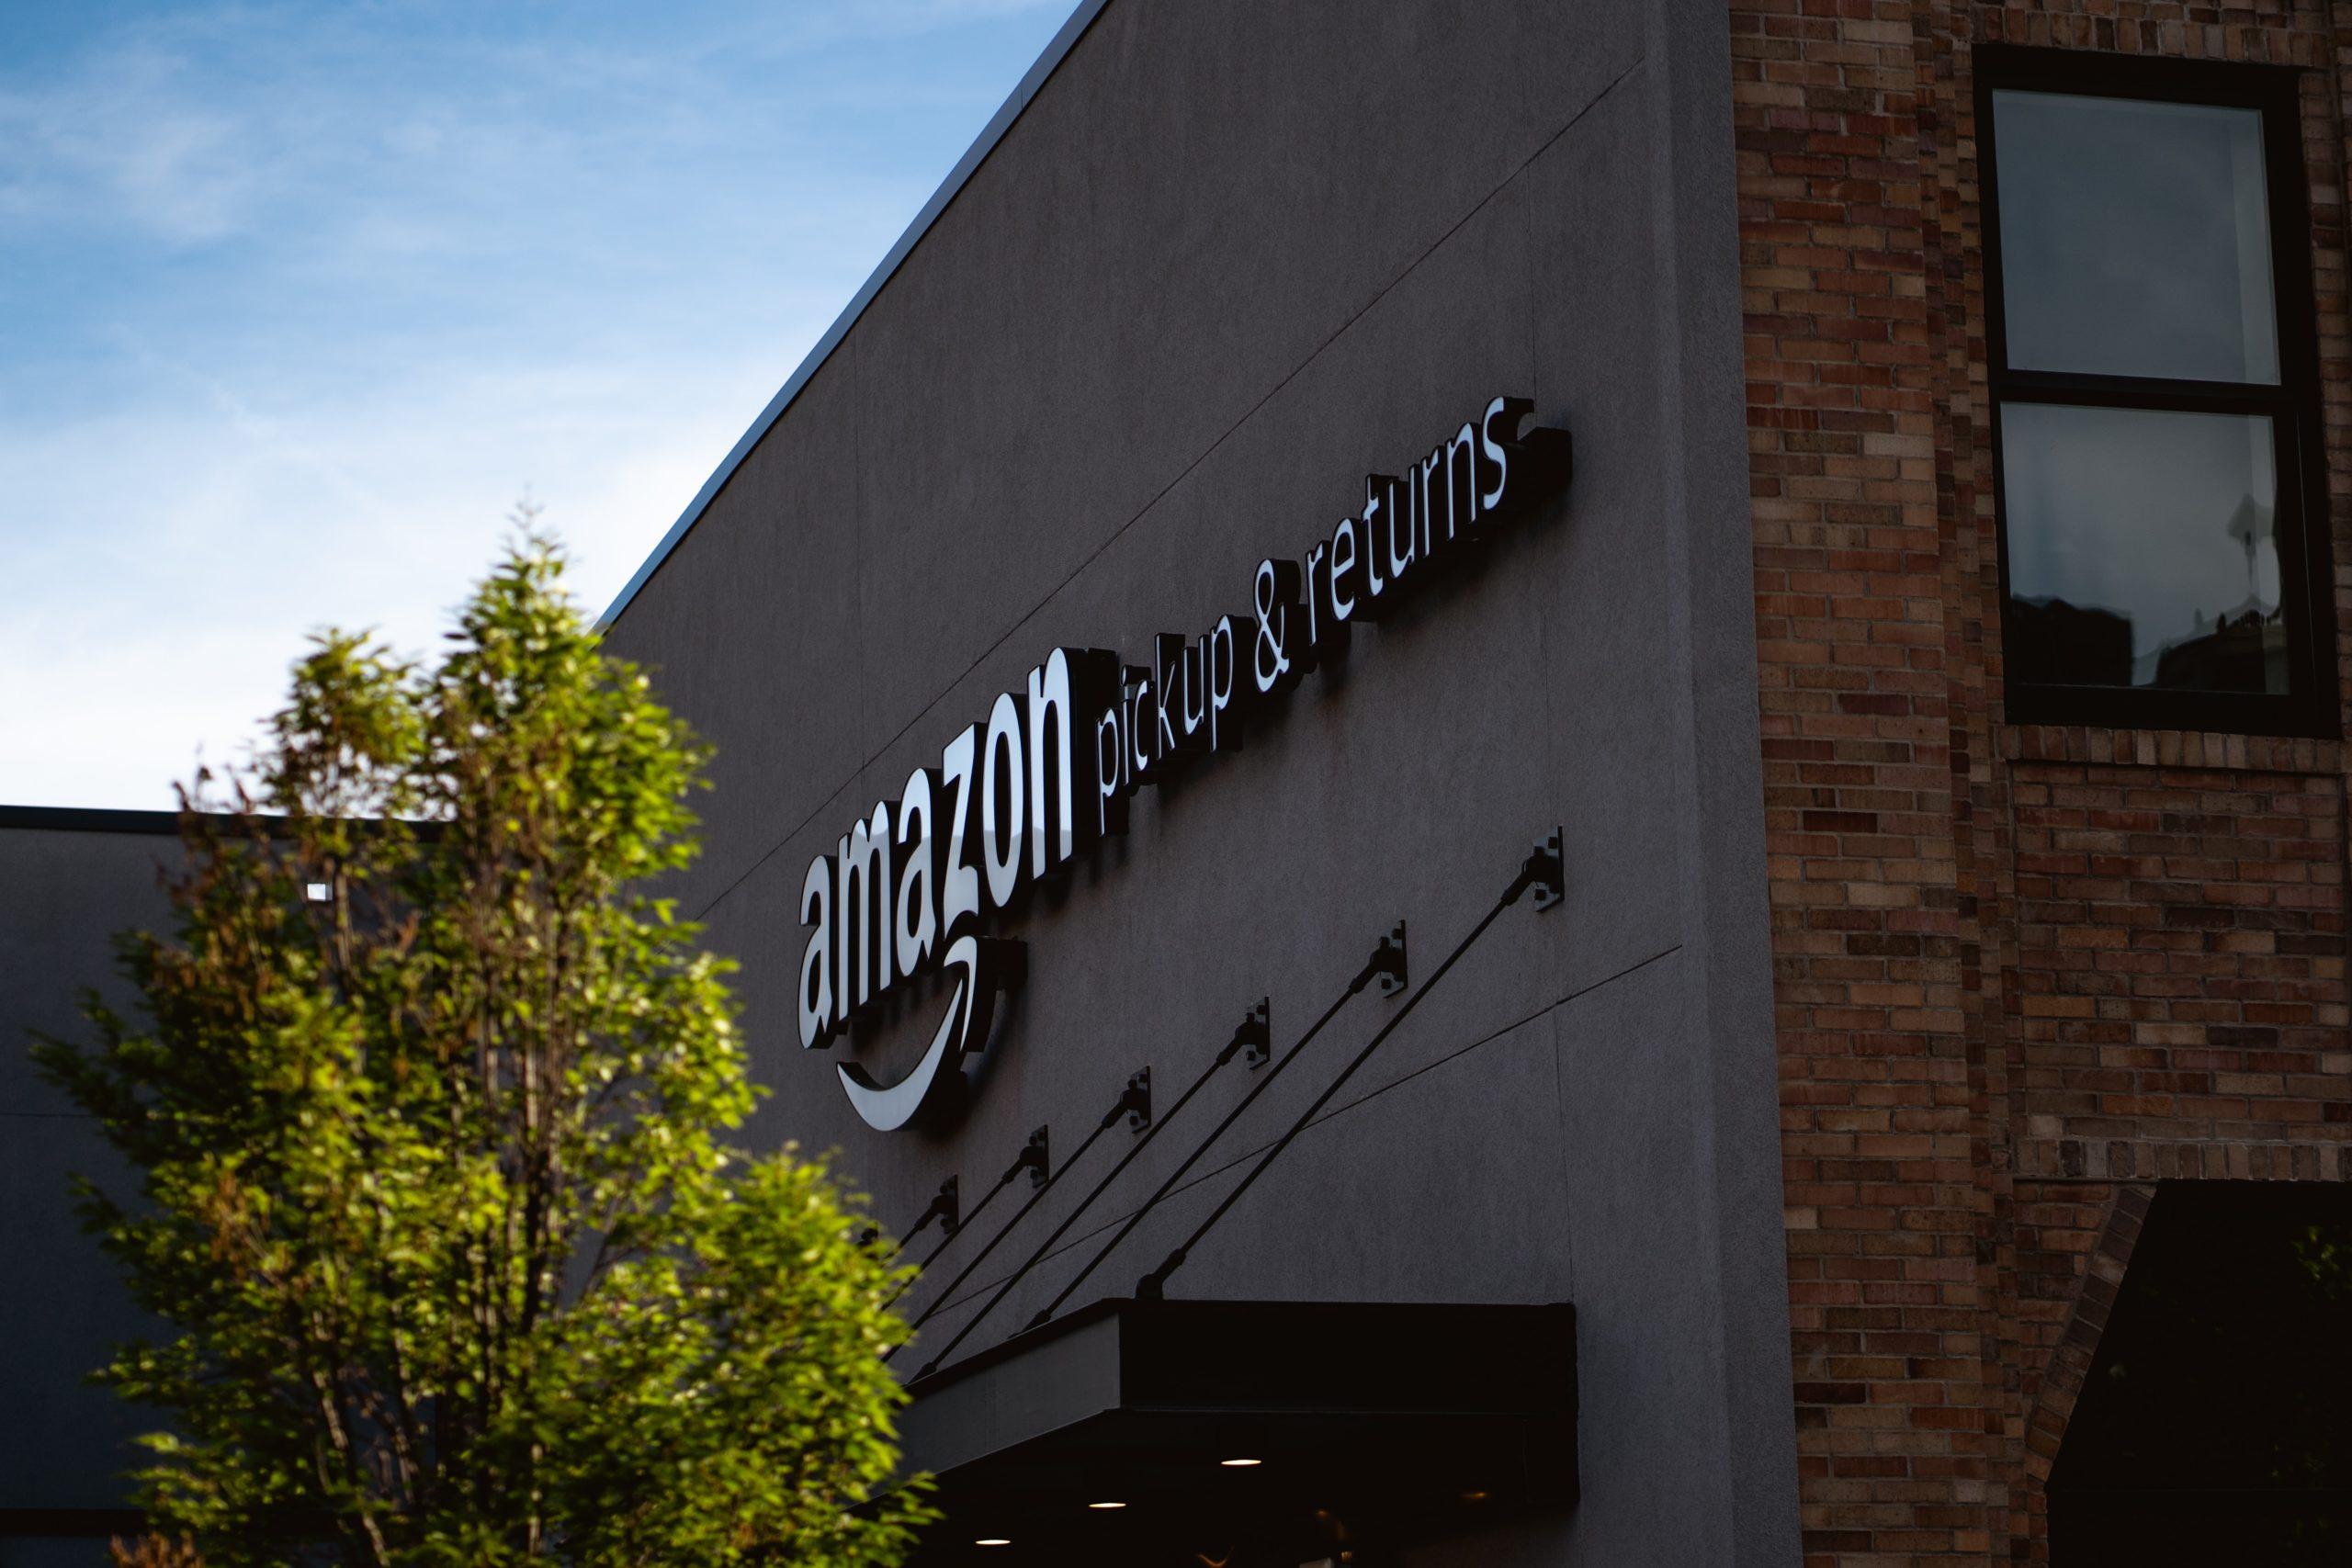 Amazon fires insiders over recent data leak